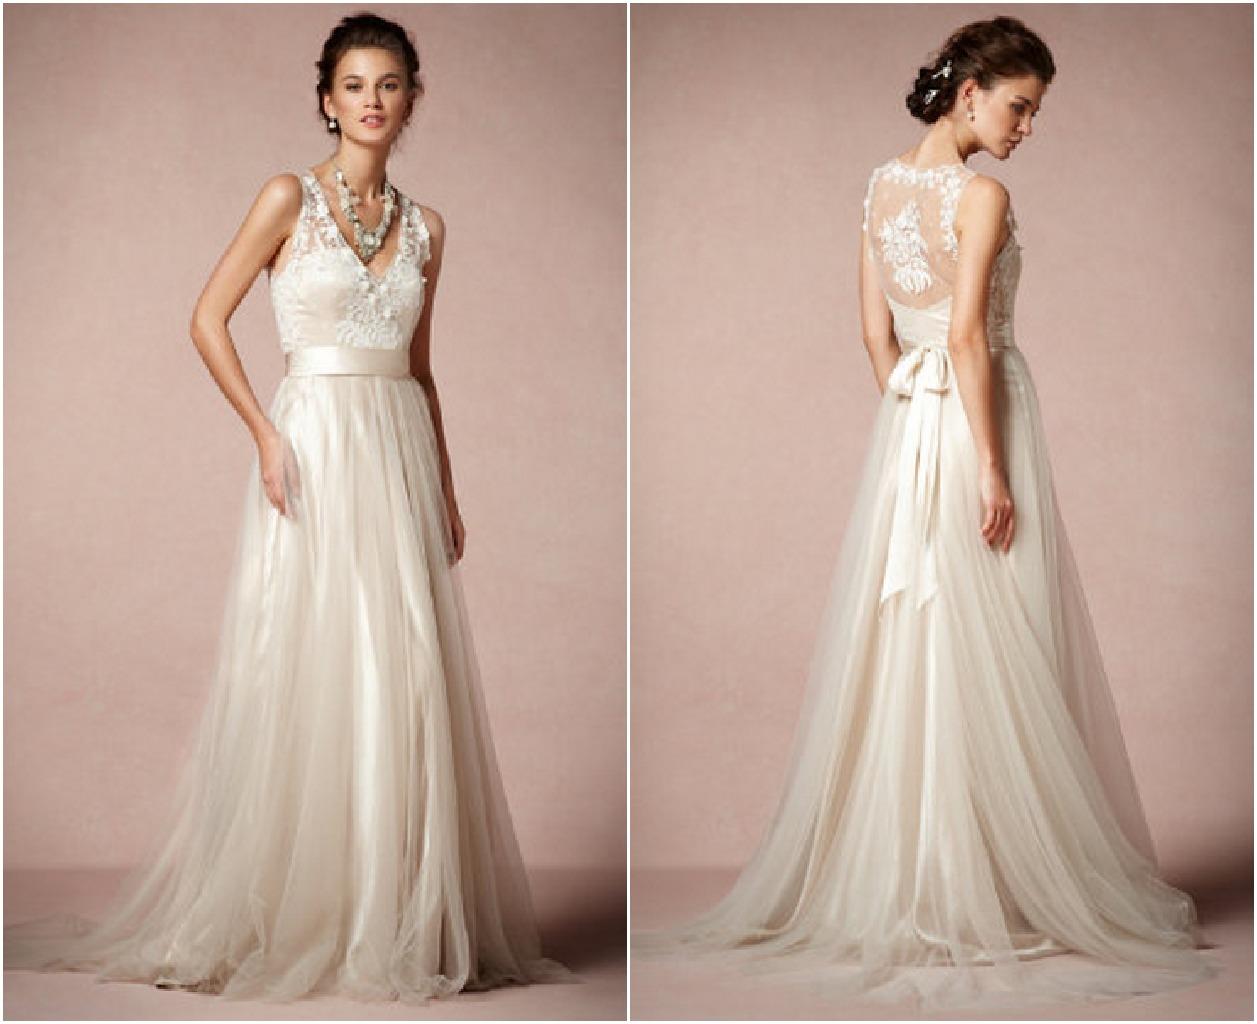 Image Result For Rustic Bride Dresses